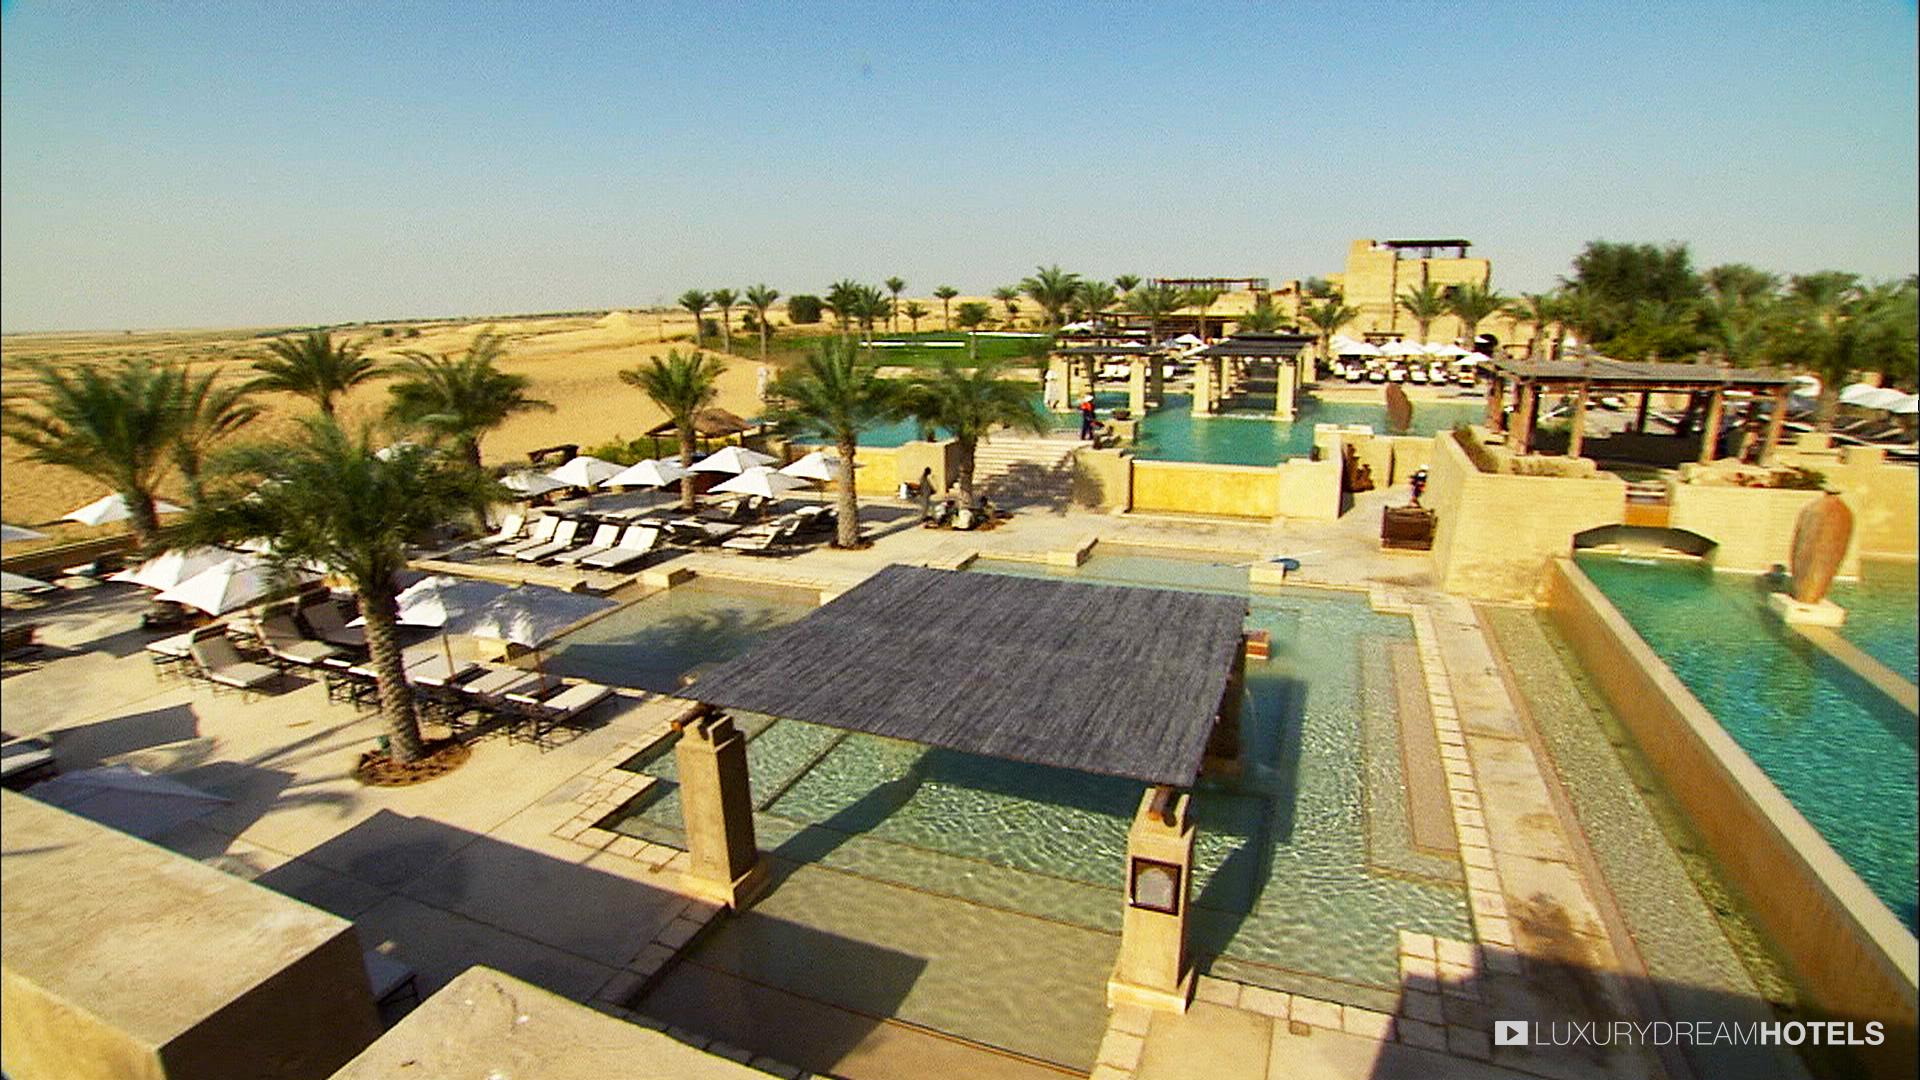 Luxury Hotel Bab Al Shams Desert Resort Spa Dubai United Arab Emirates Luxury Dream Hotels